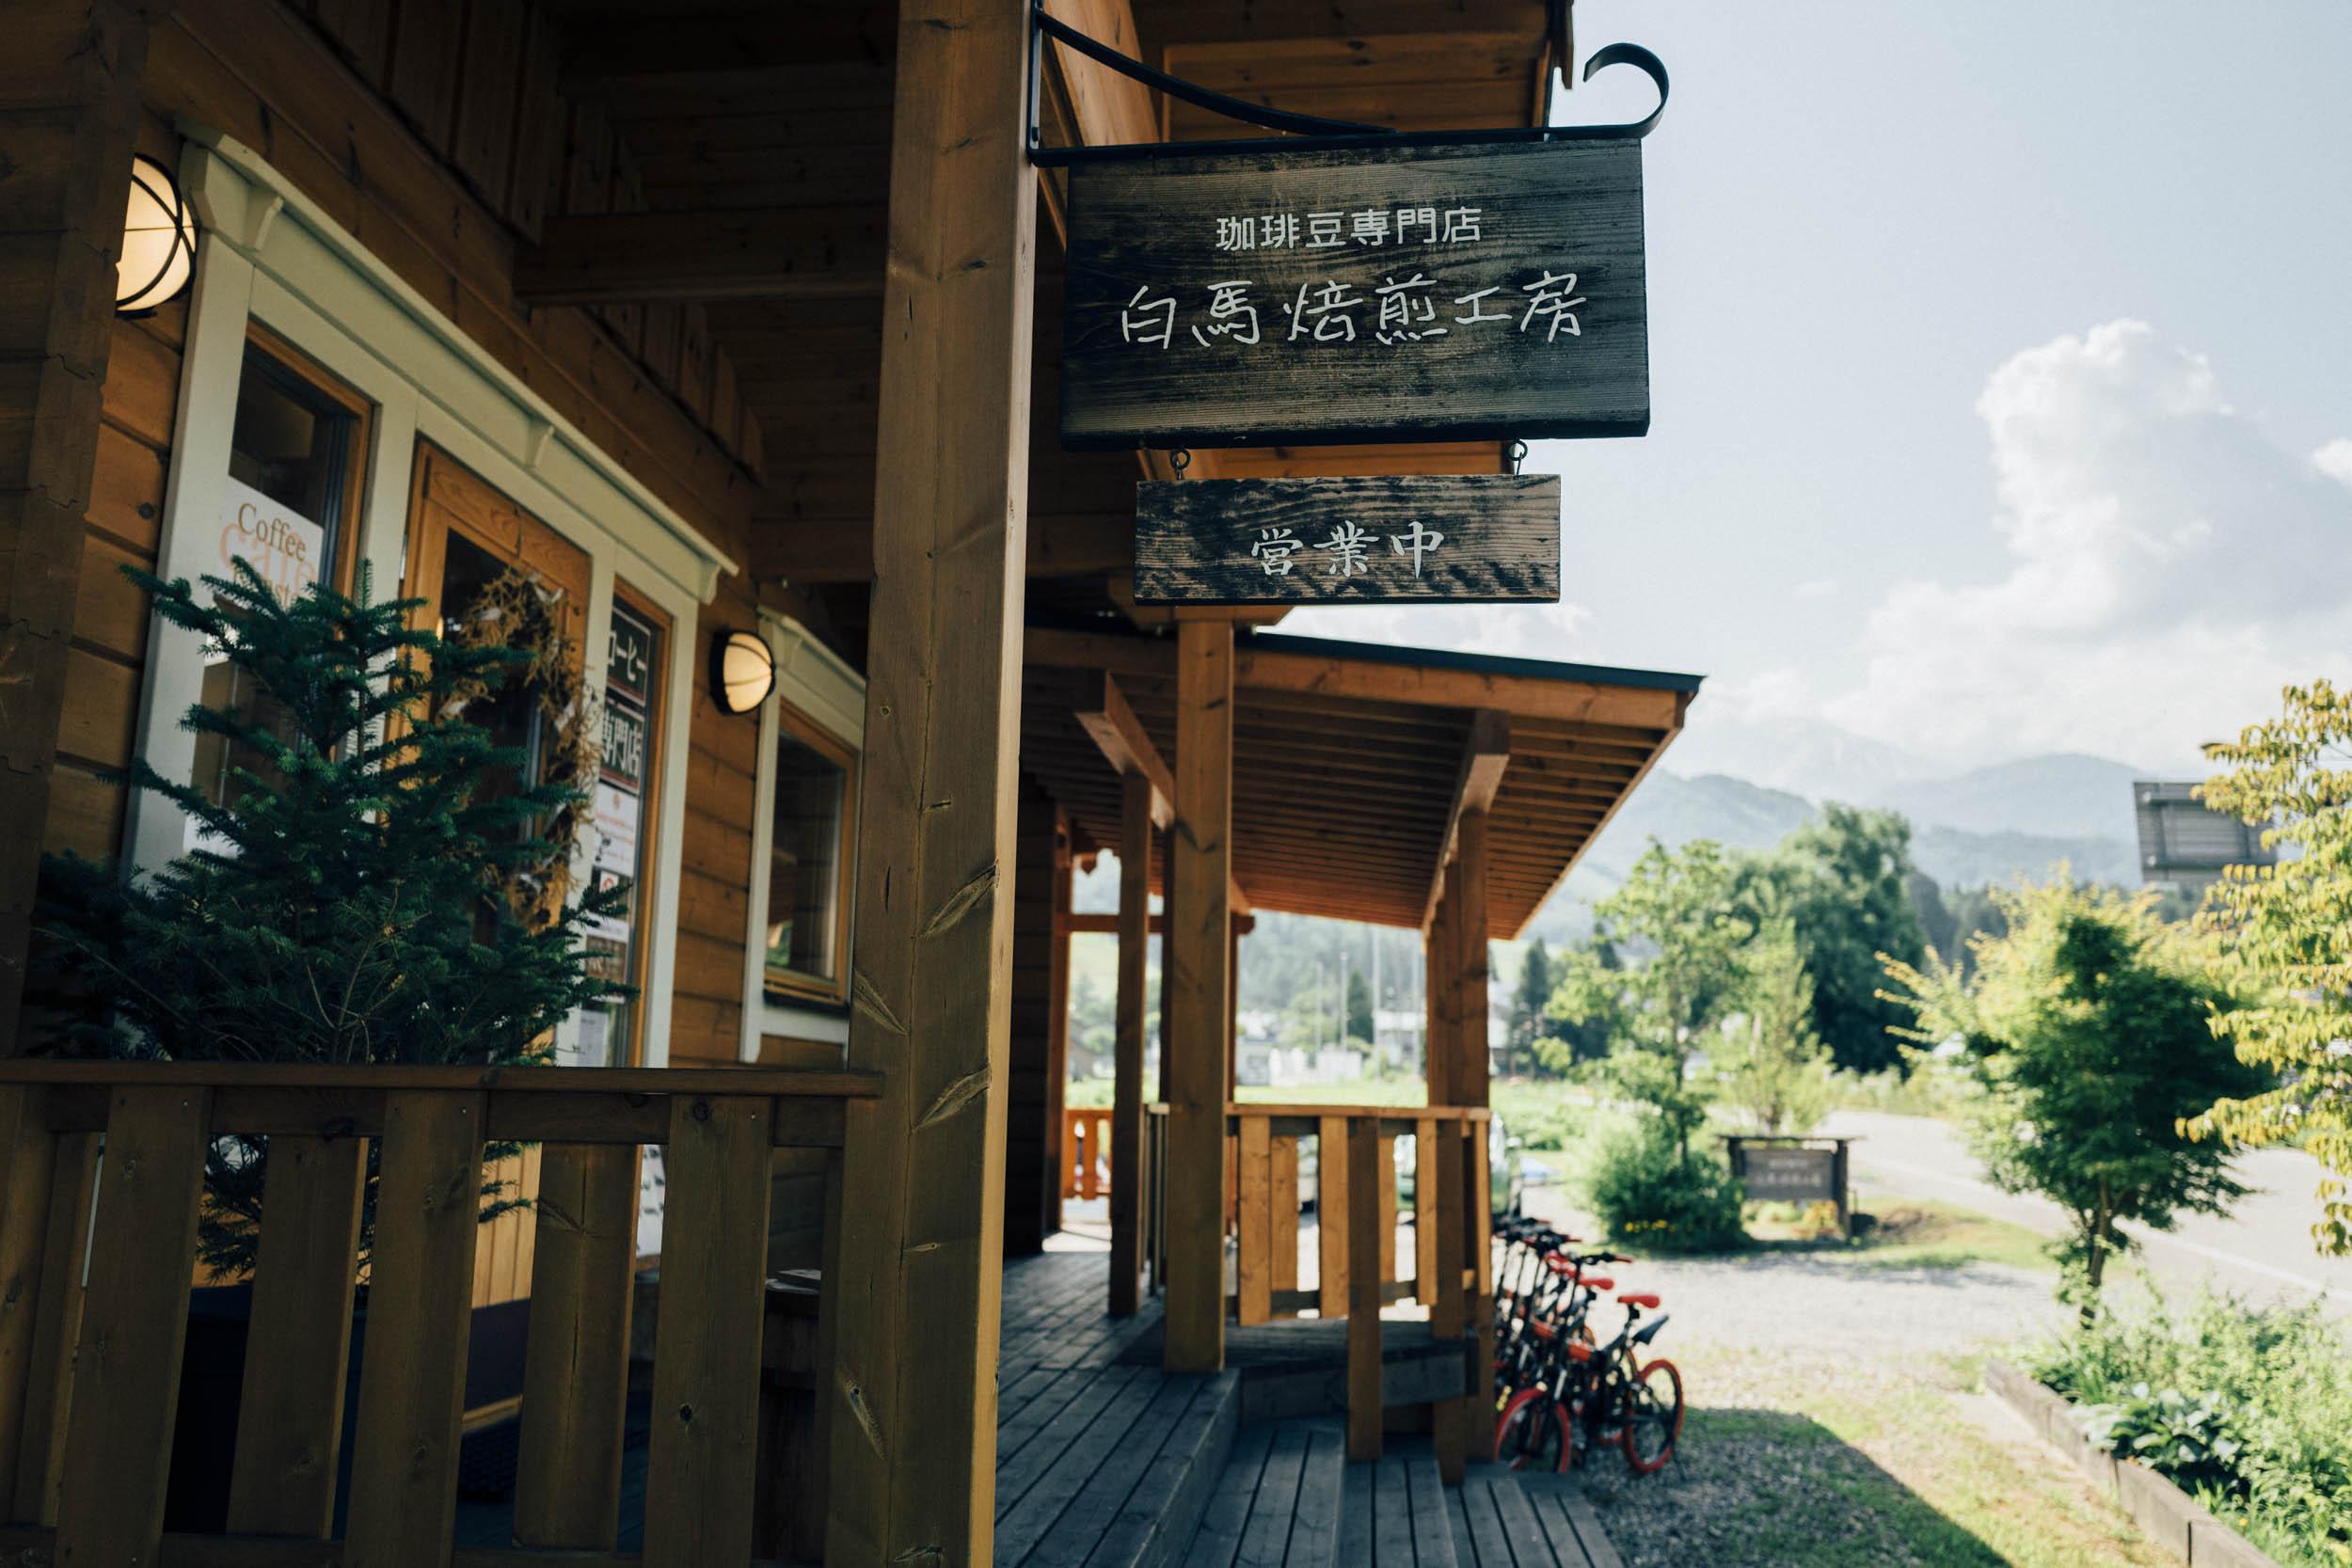 L1040093 長野県白馬村、Grand Cherokeeオーナーへインタビュー。避暑地としてもアクティブに過ごすにも良し!カフェ観光スポットもご紹介